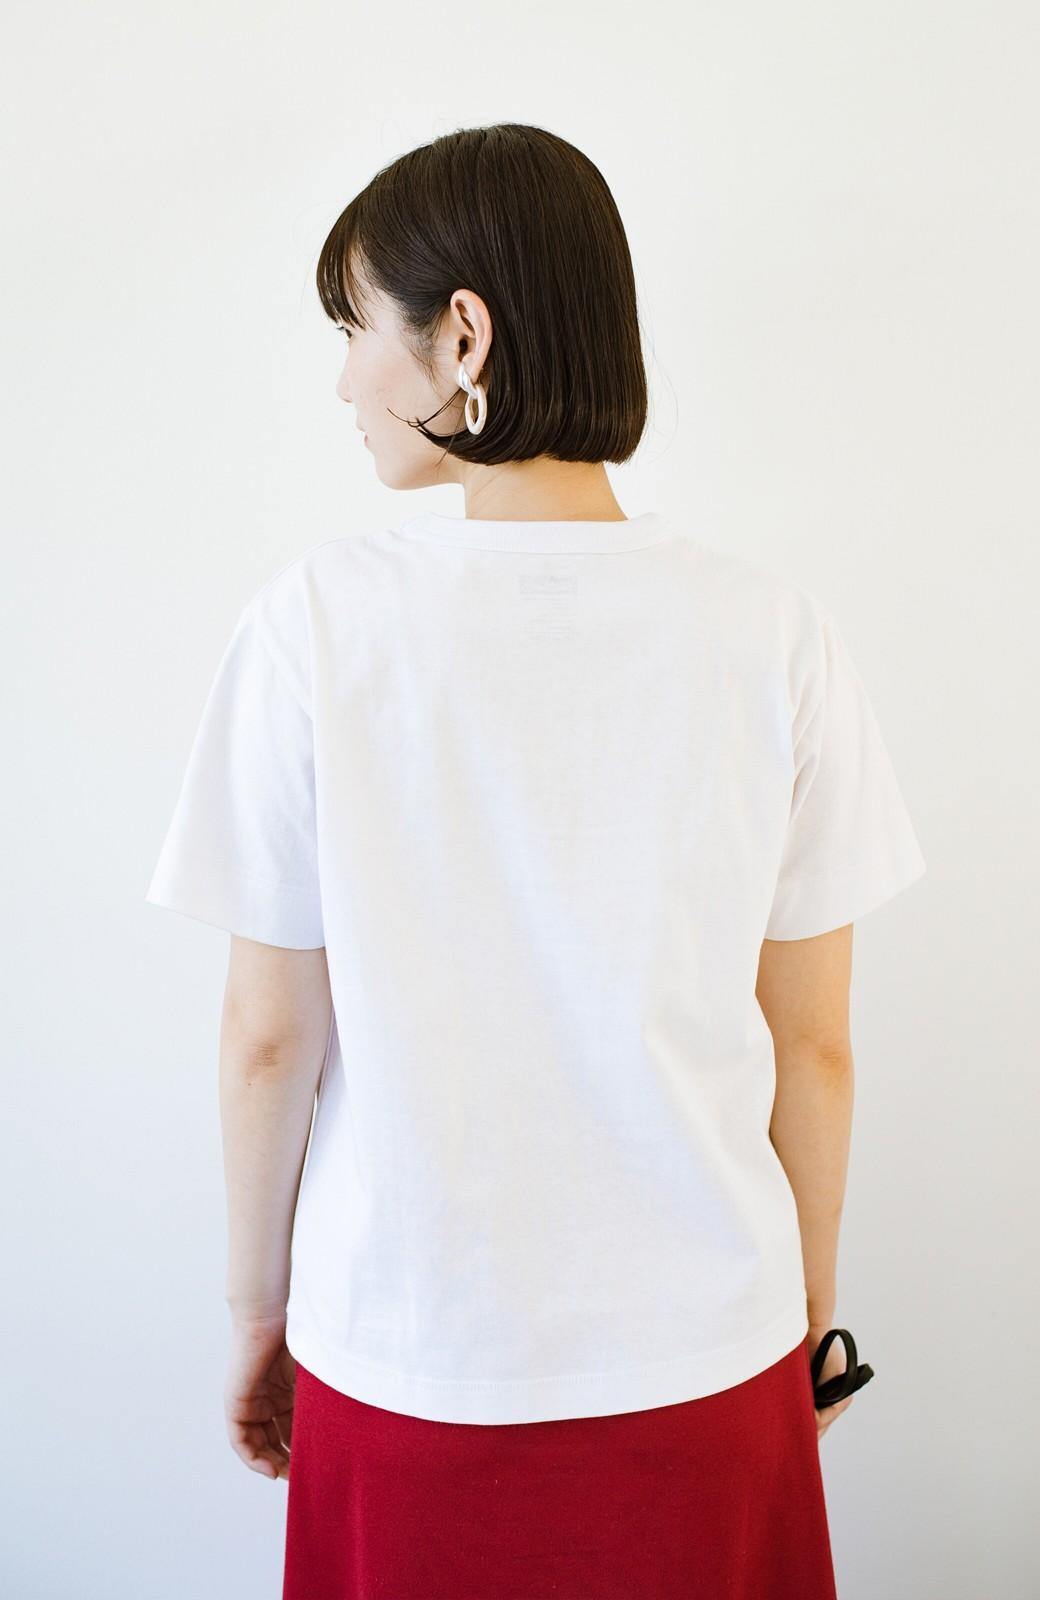 haco! さりげないロゴがコーデのポイントになるファンクションファブリックジャージークルーネックTシャツ by Healthknit <ホワイト>の商品写真11